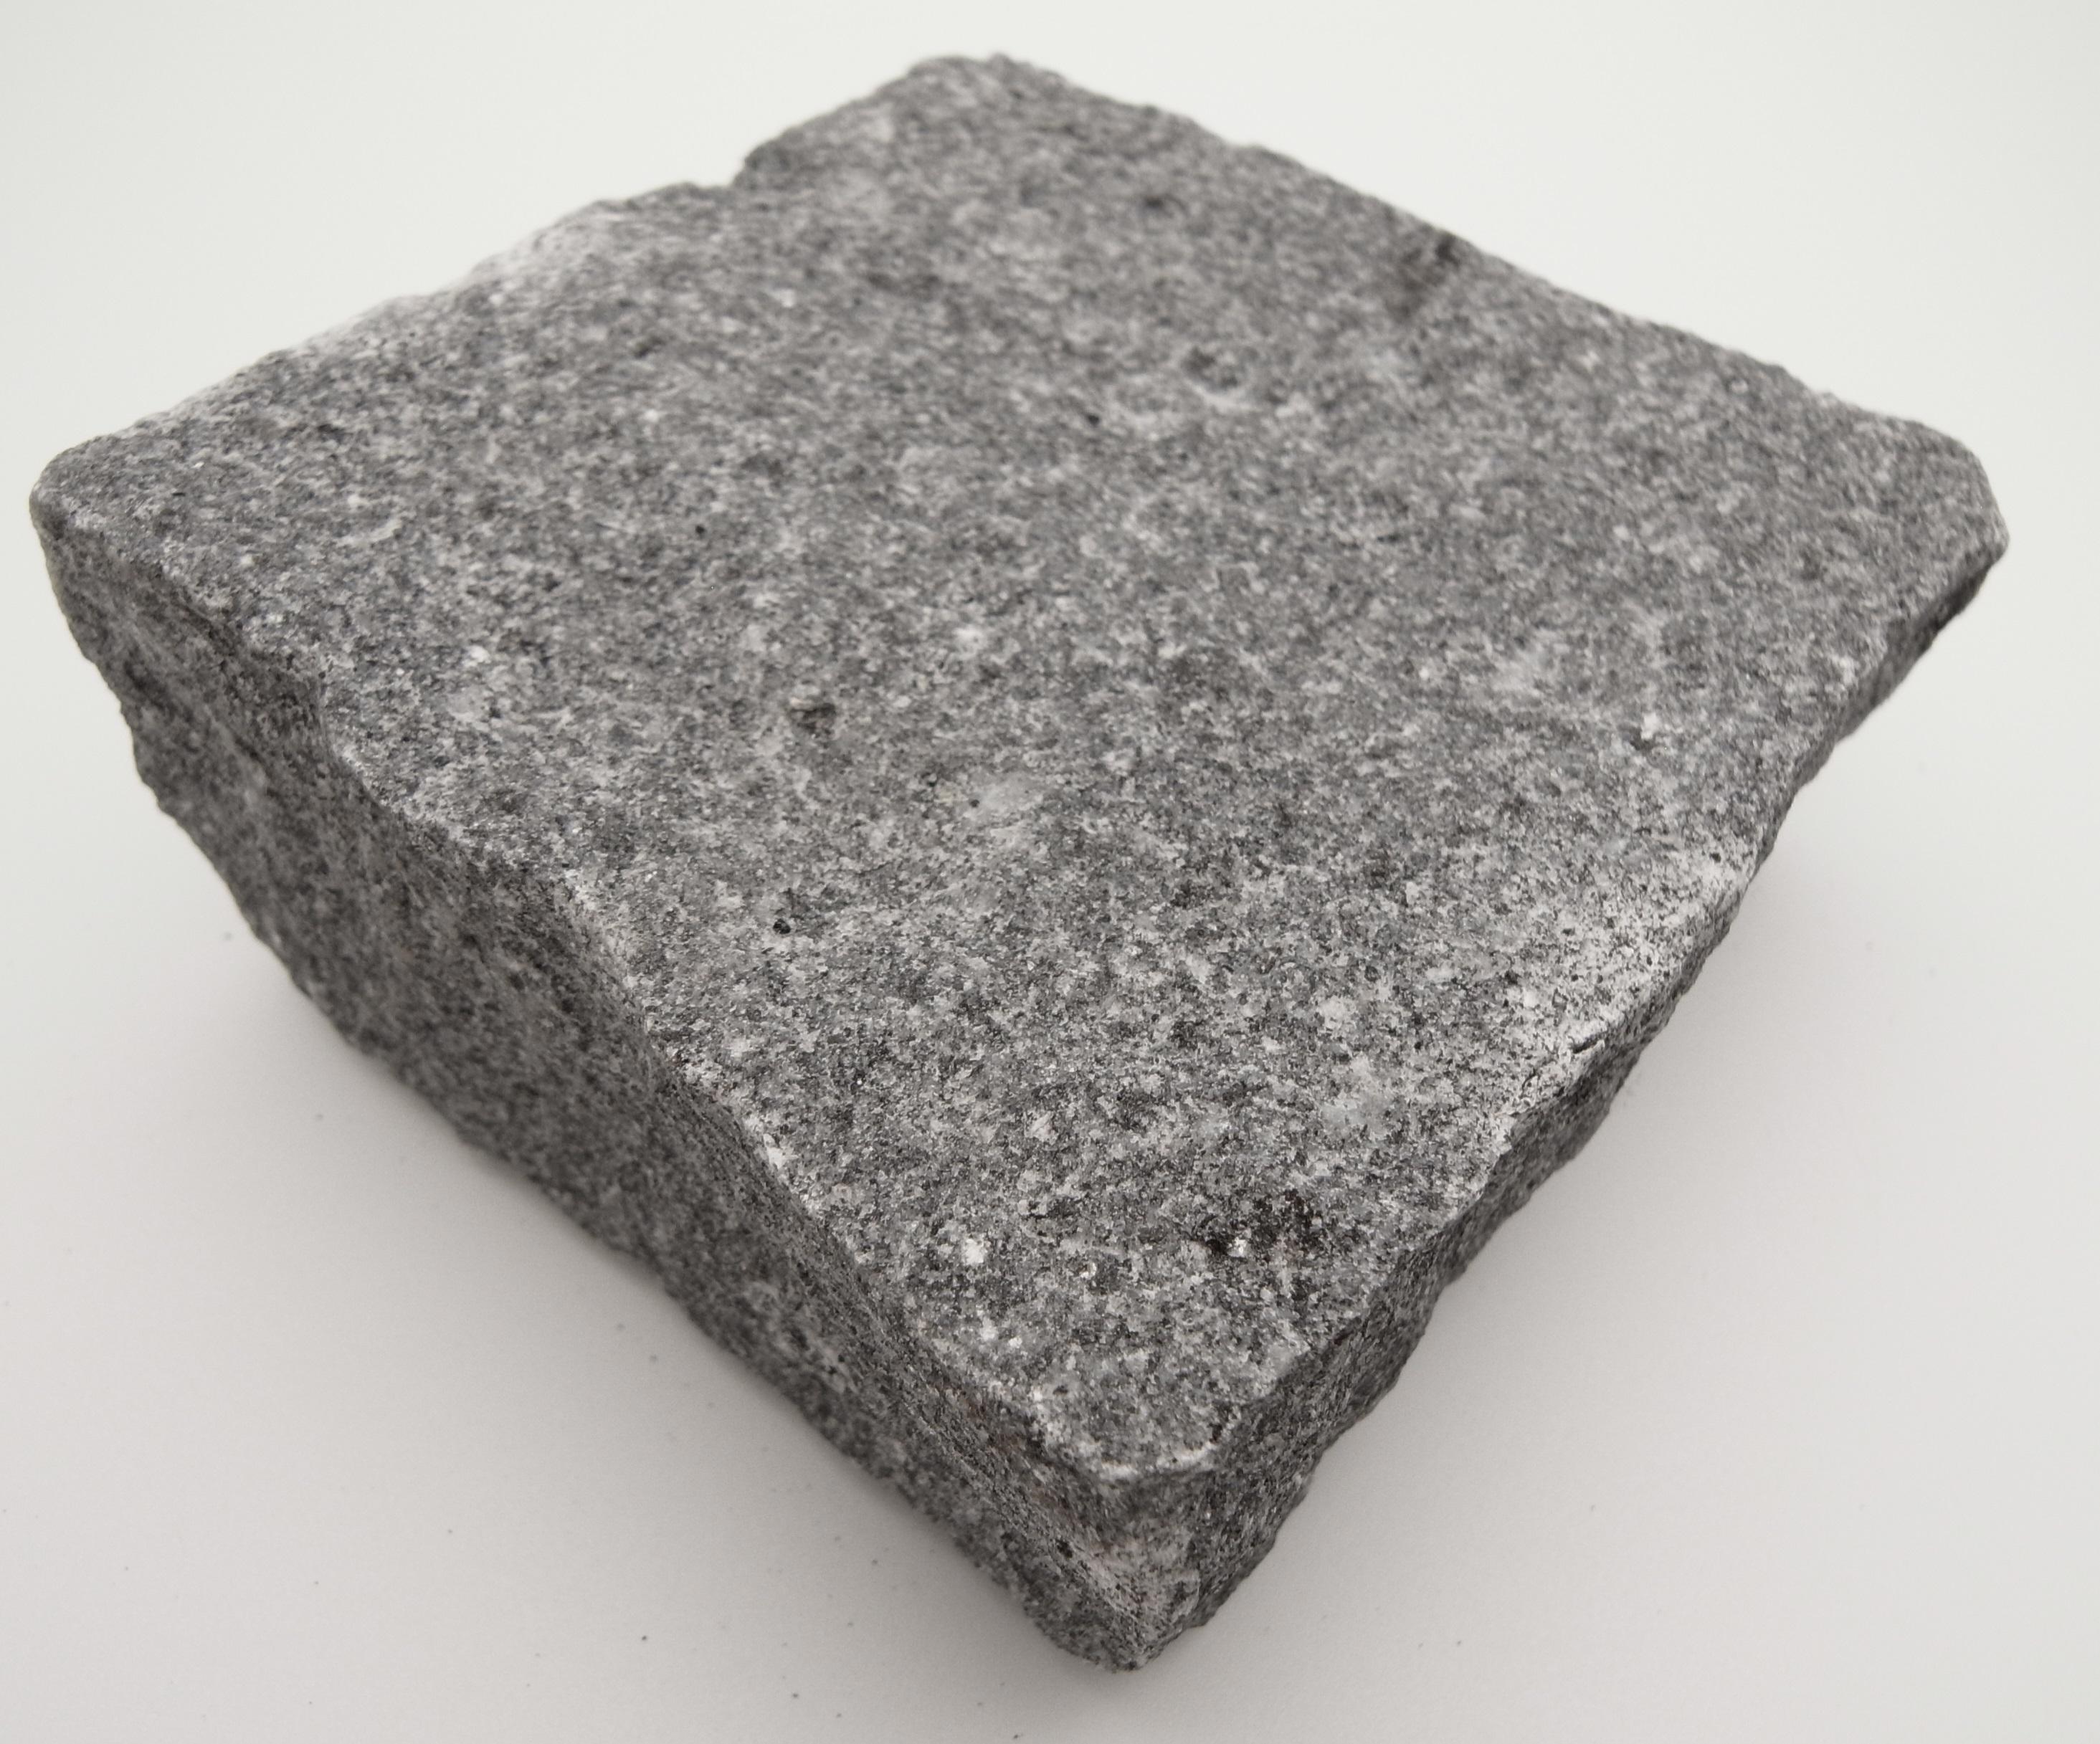 Stone Marble Granite : Dark grey granite setts in natural cropped finish per m